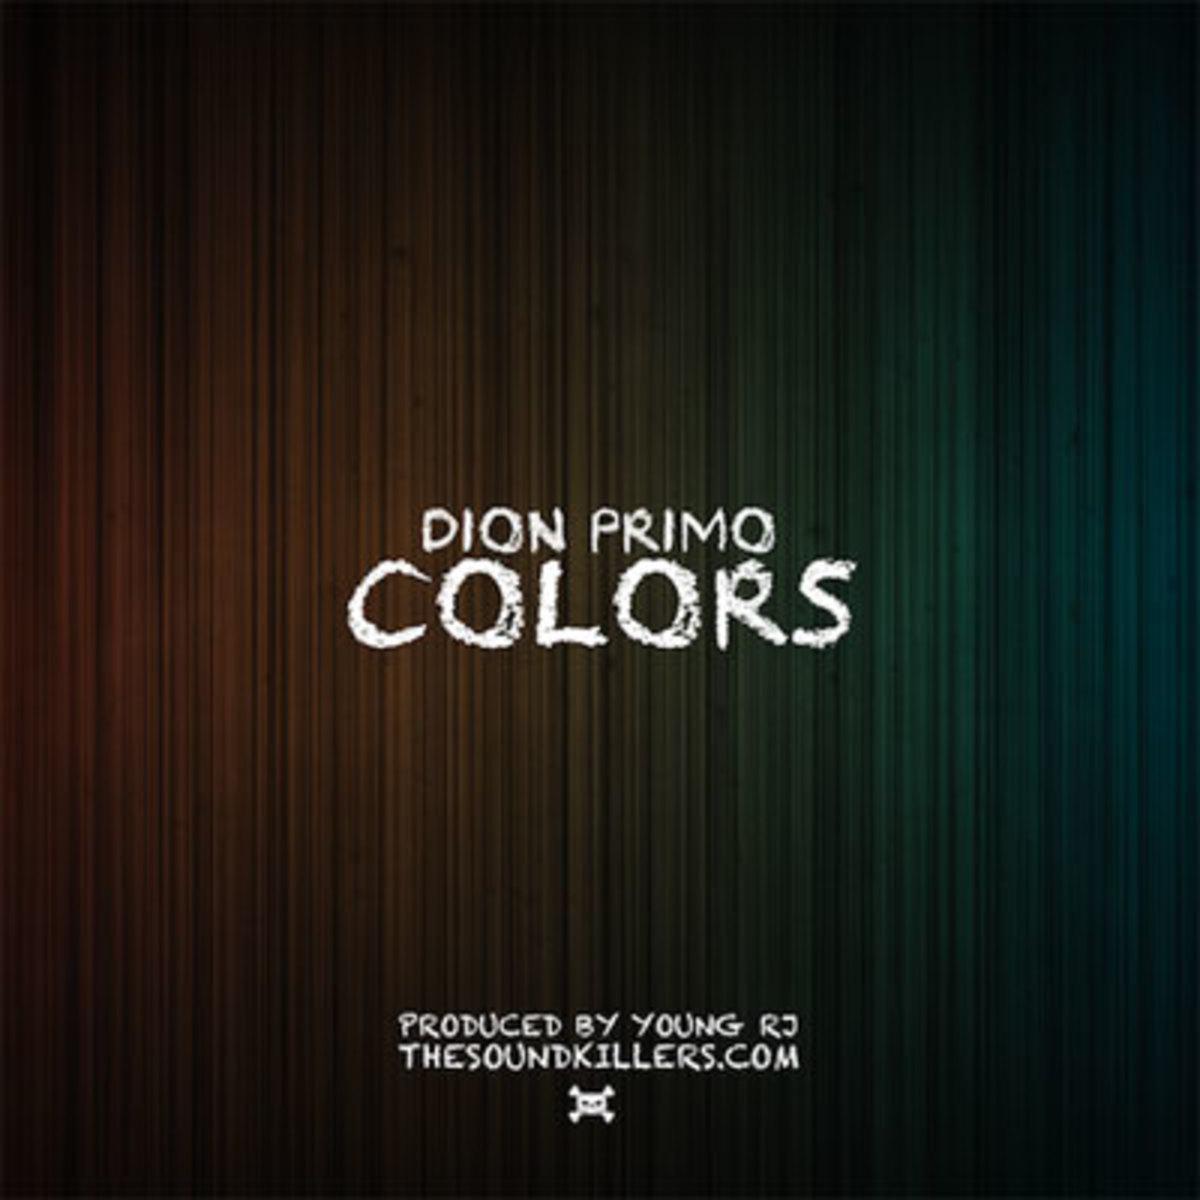 dionpromo-colors.jpg